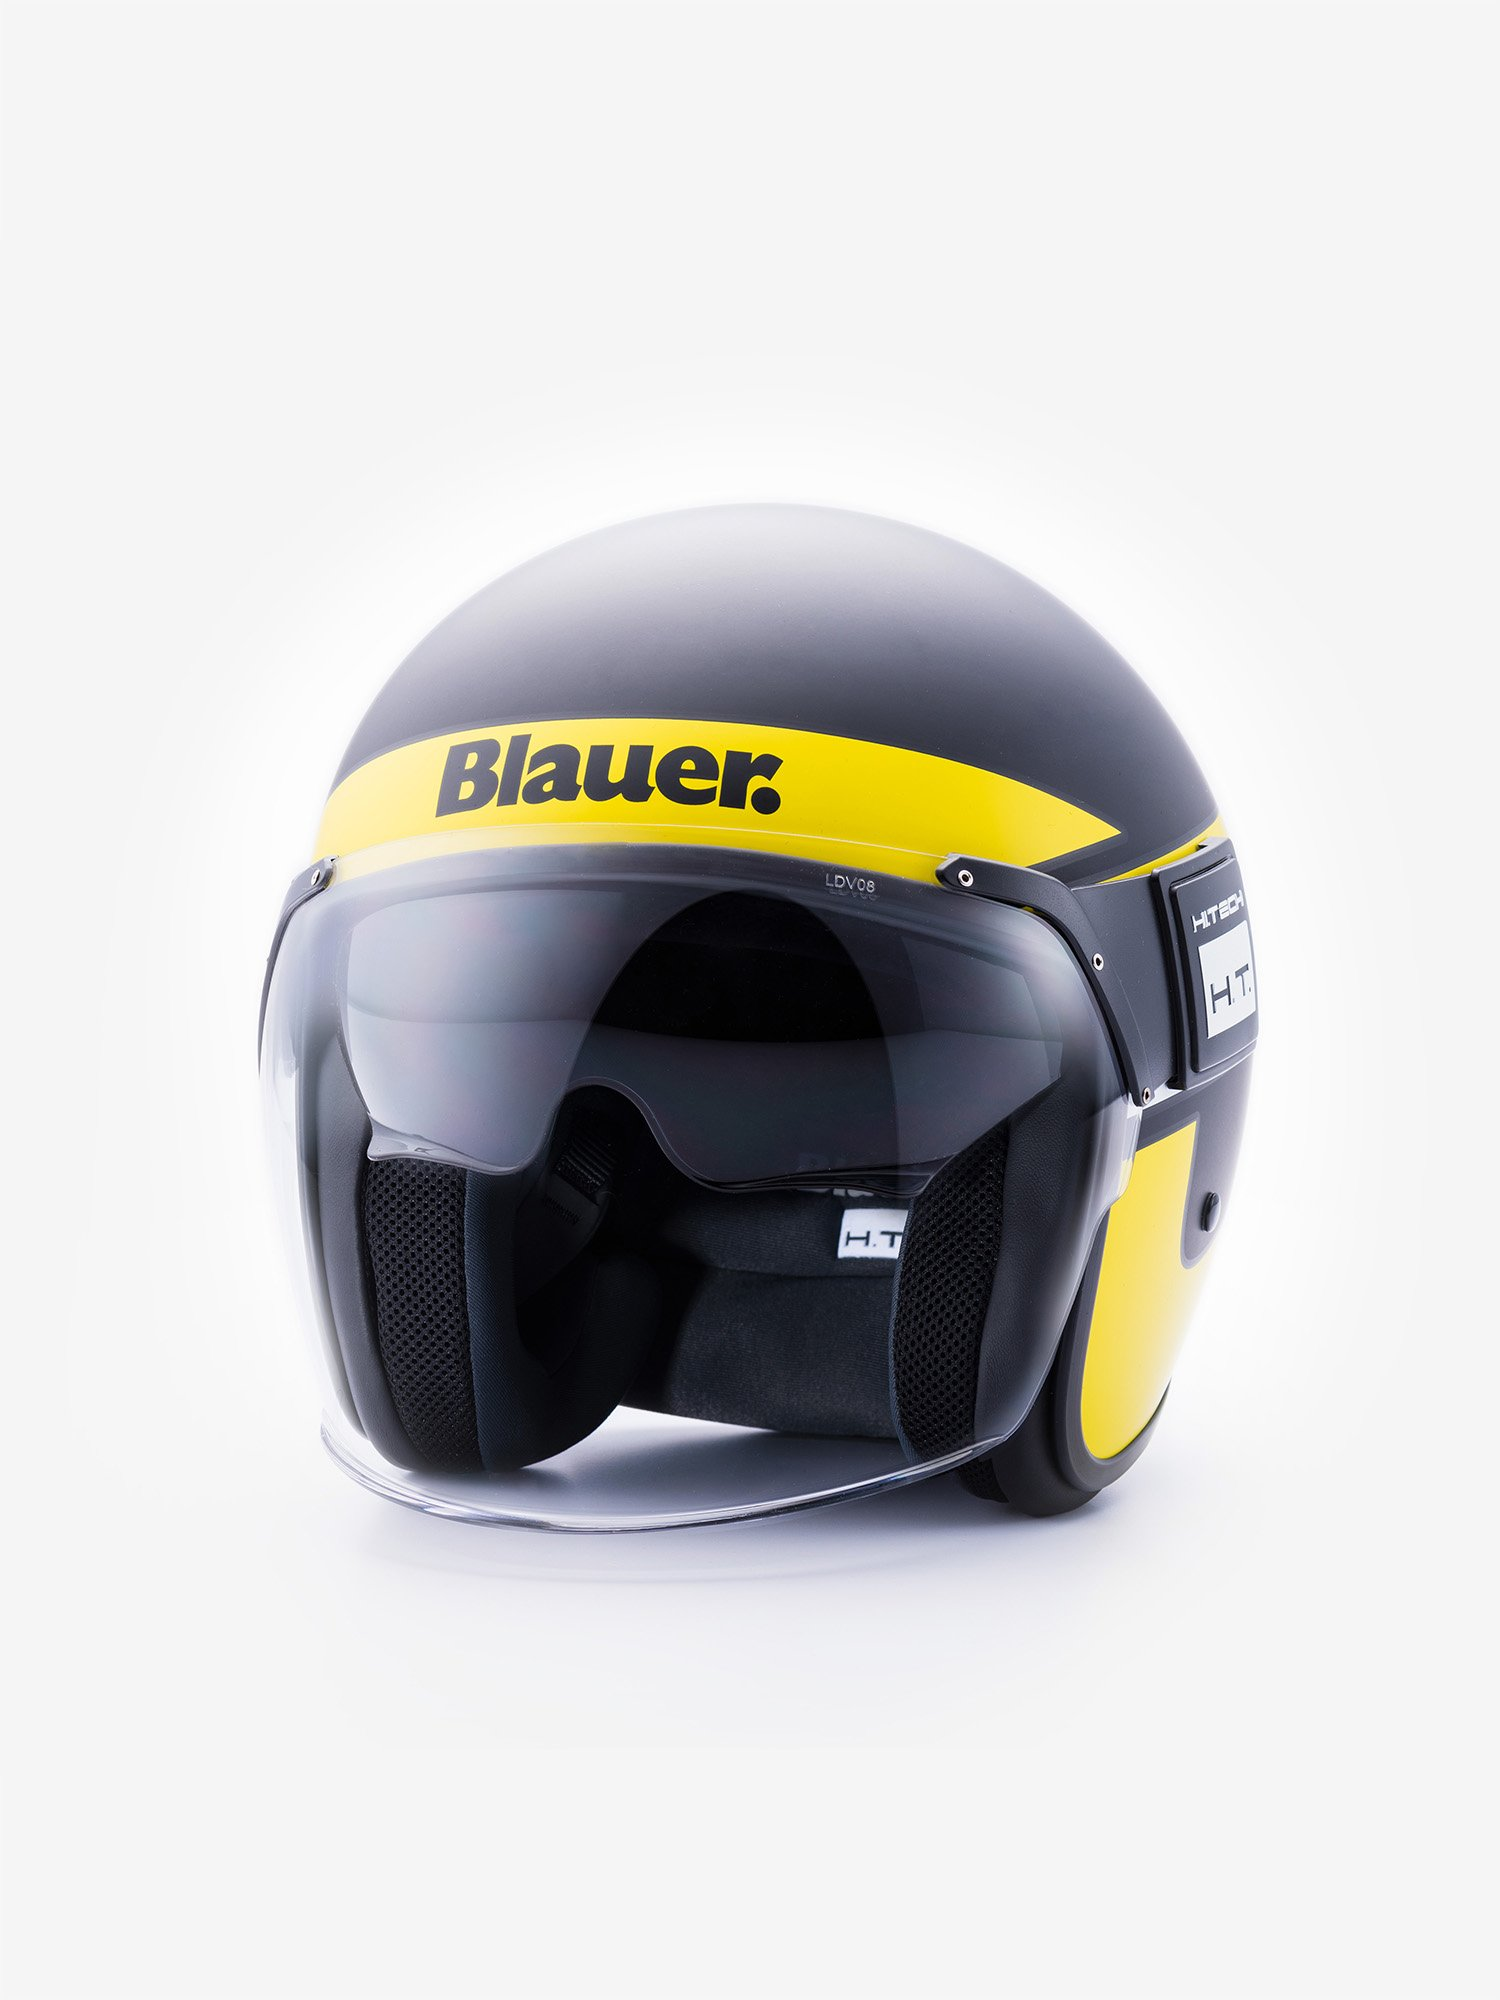 Blauer - POD STRIPES DOUBLE VISOR - Black Matt / Yellow Fluo - Blauer